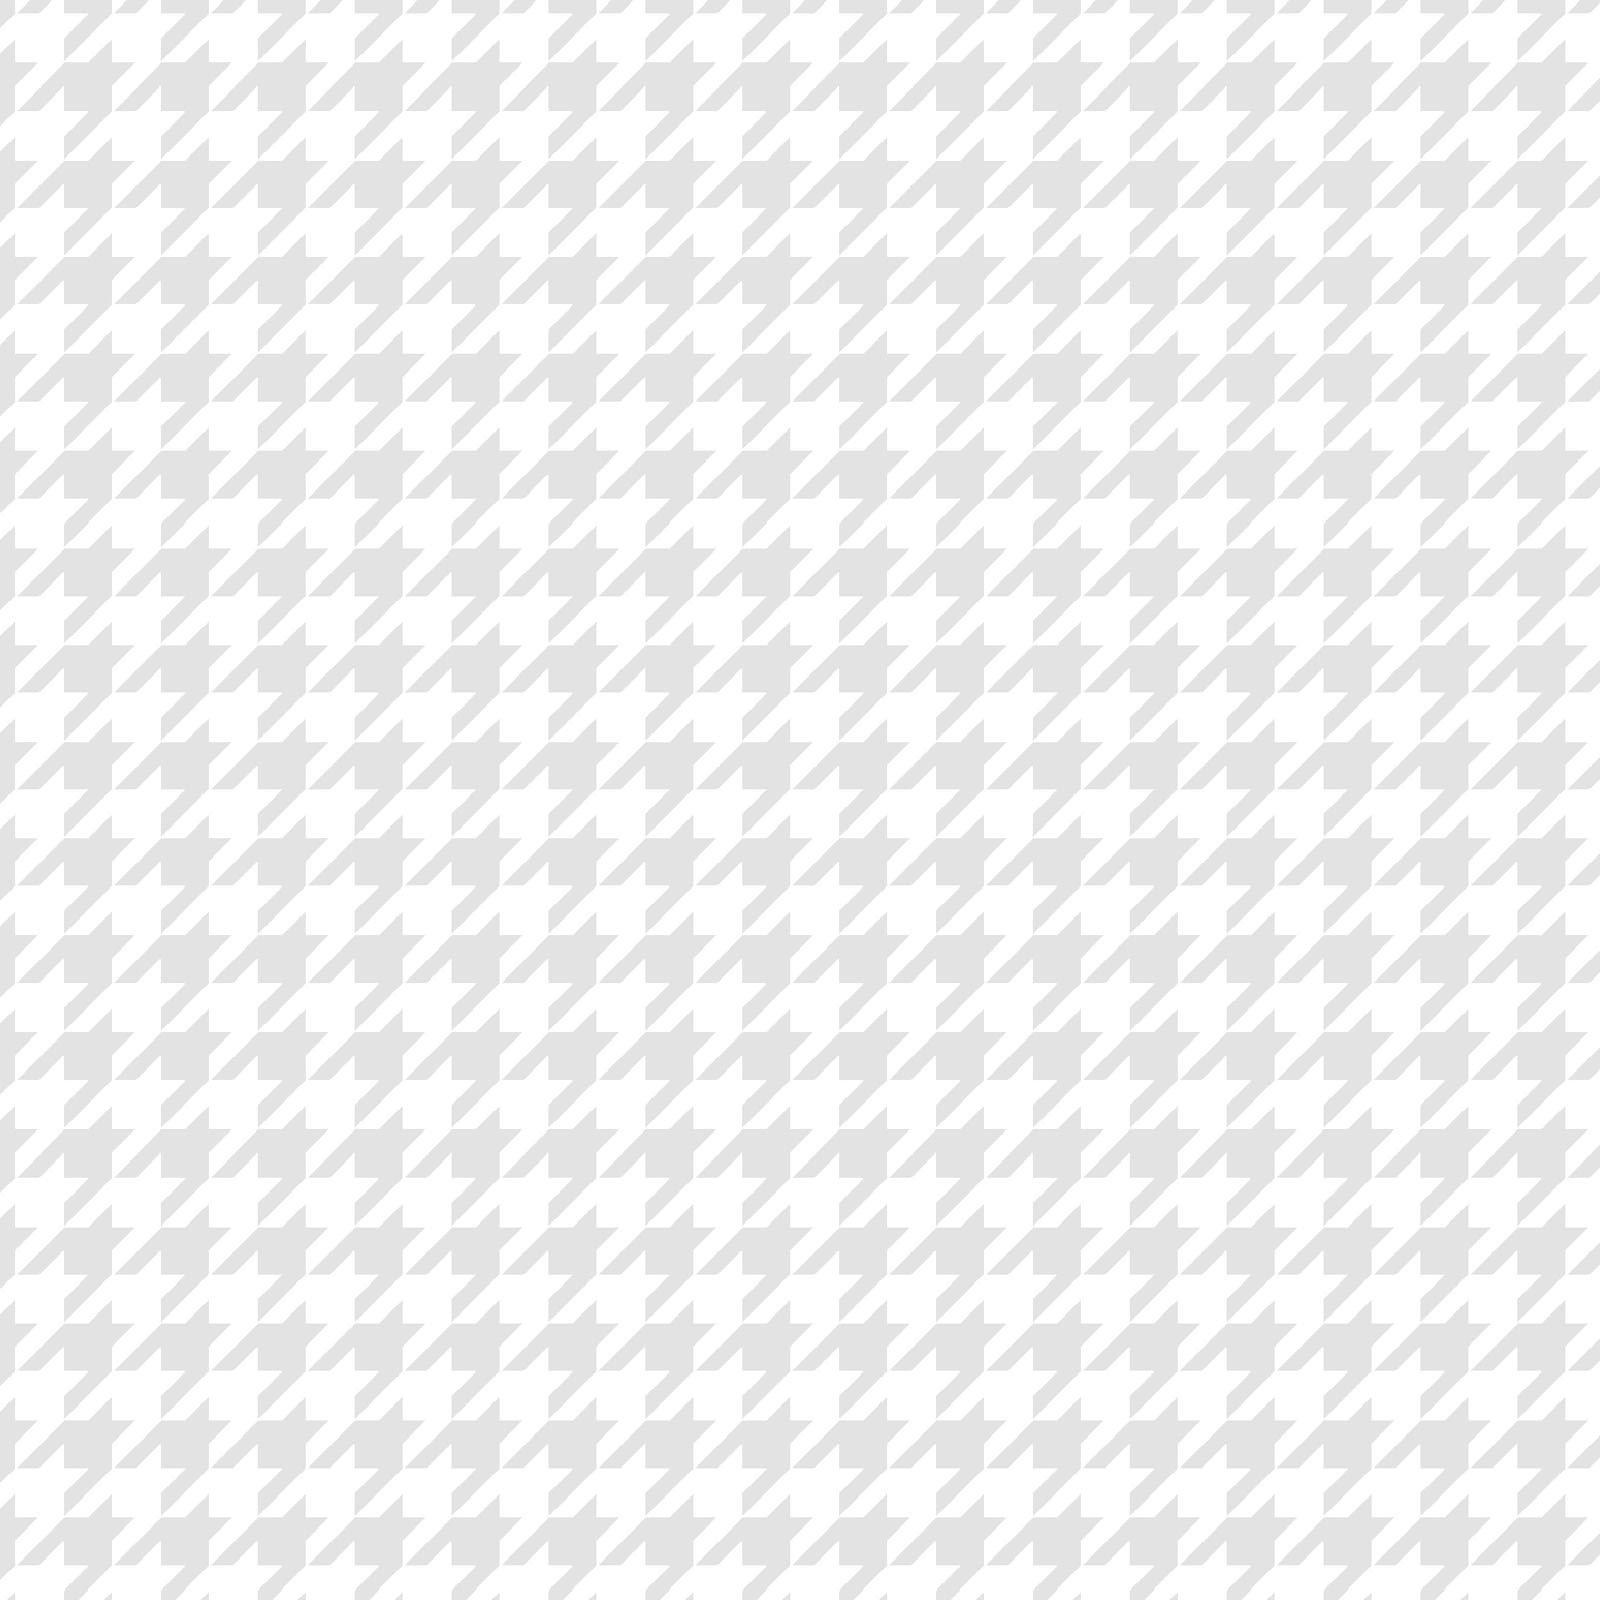 KimberBell Basics White on White Houndstooth 8206M-WW